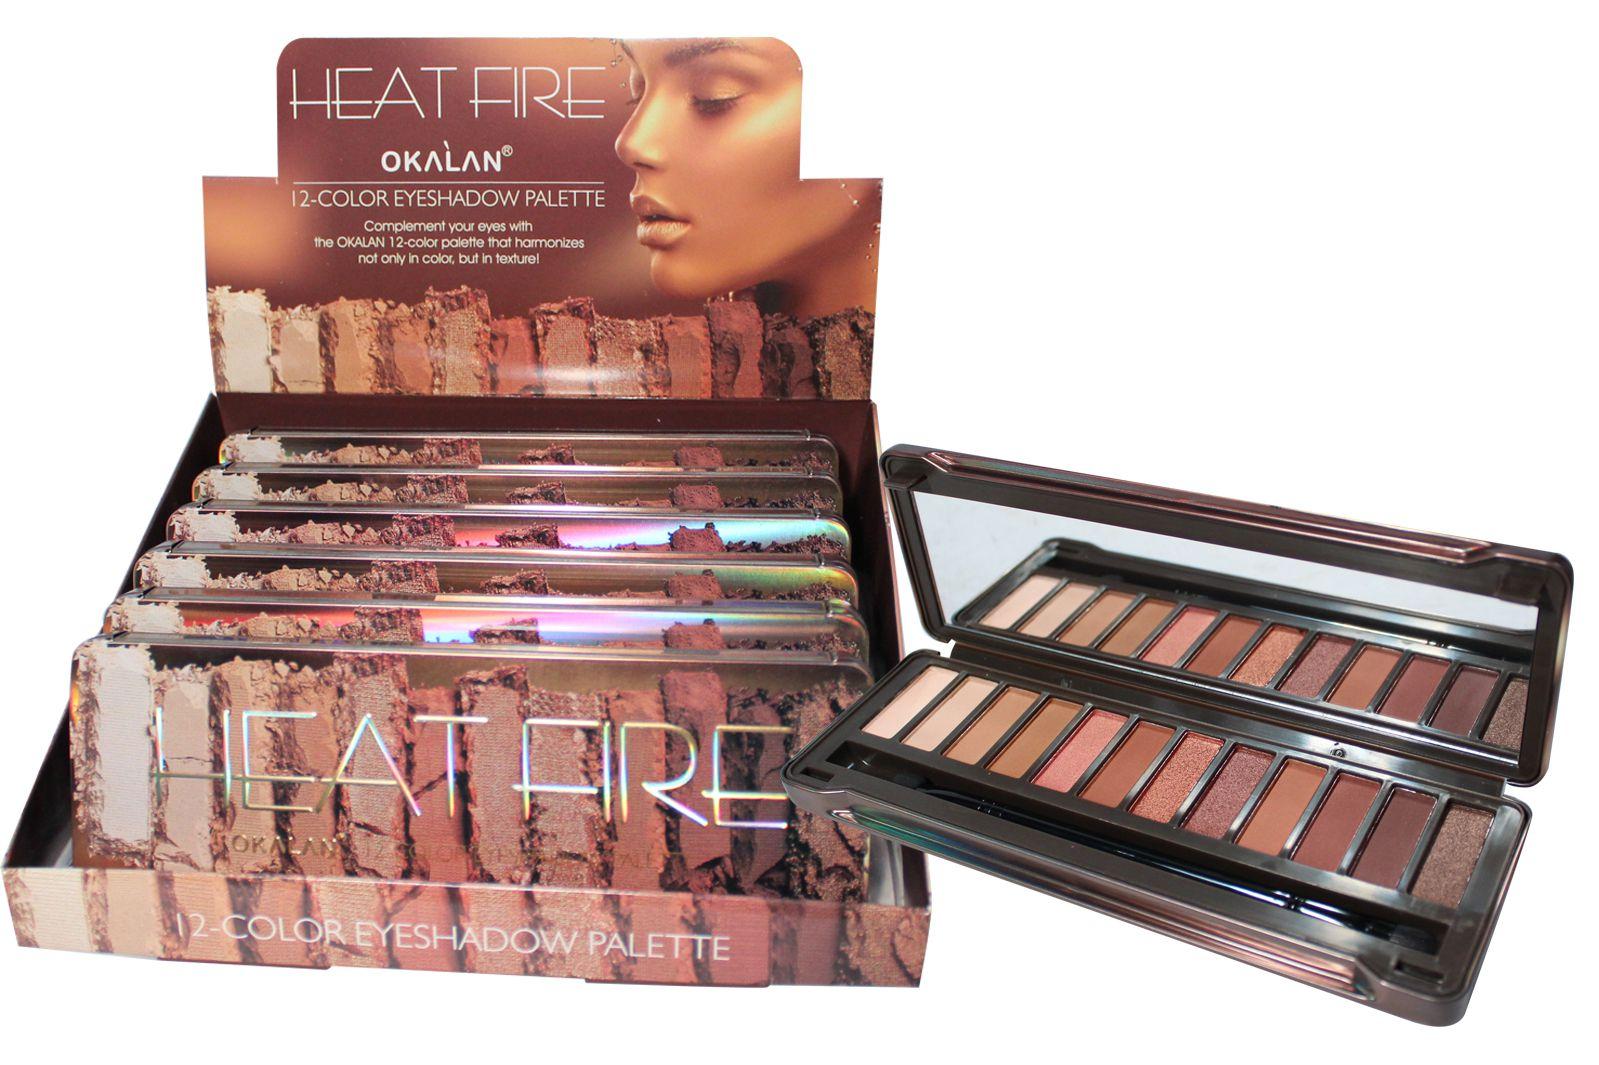 Okalan-Heat-Fire-12-Color-Eyeshadow-Palette-OKL-E0671